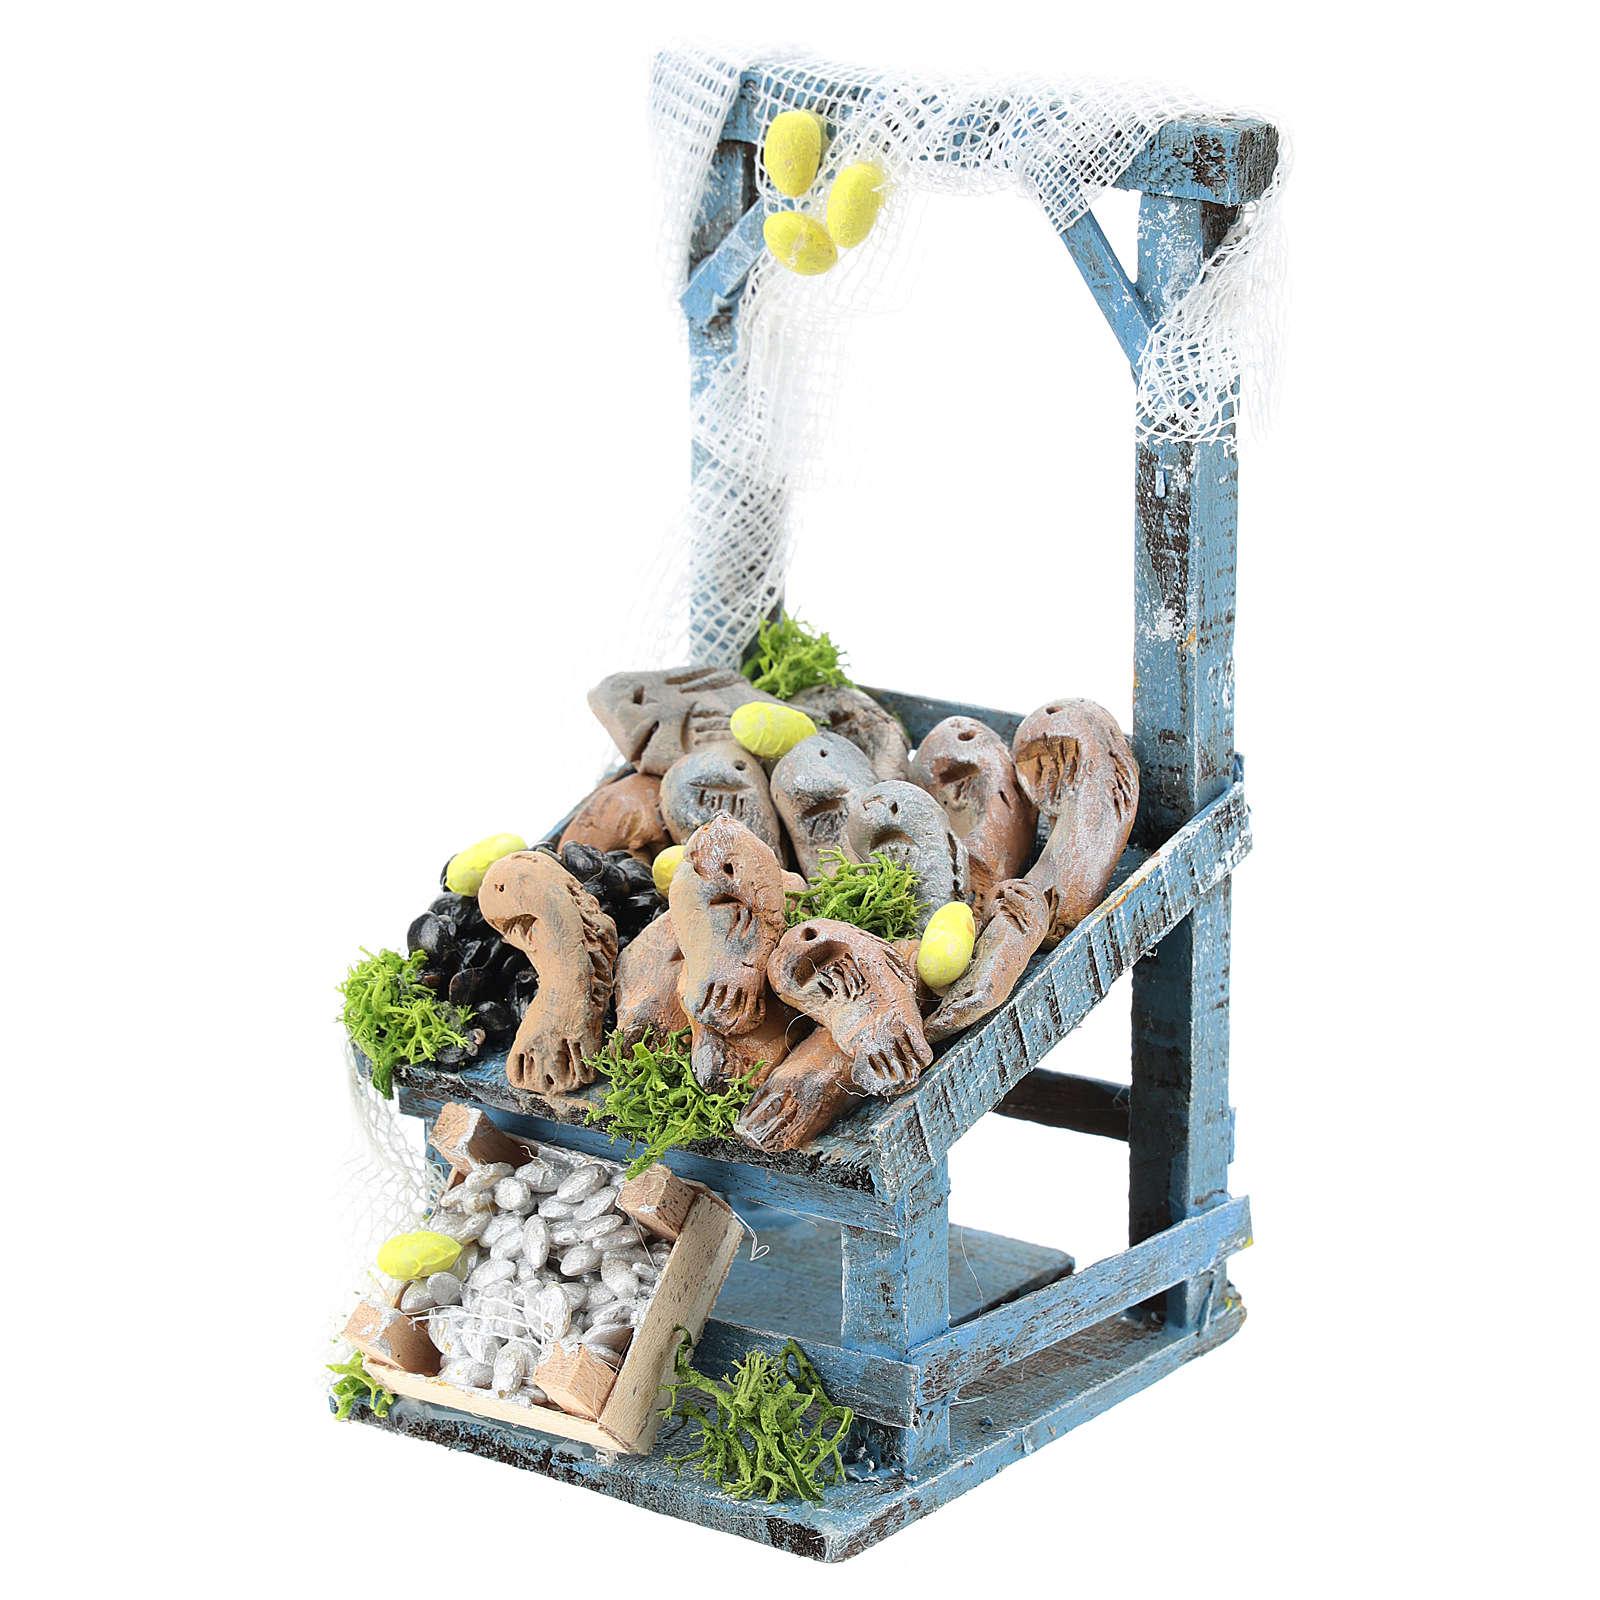 Fish stand for Neapolitan Nativity Scene of 6-8 cm 4